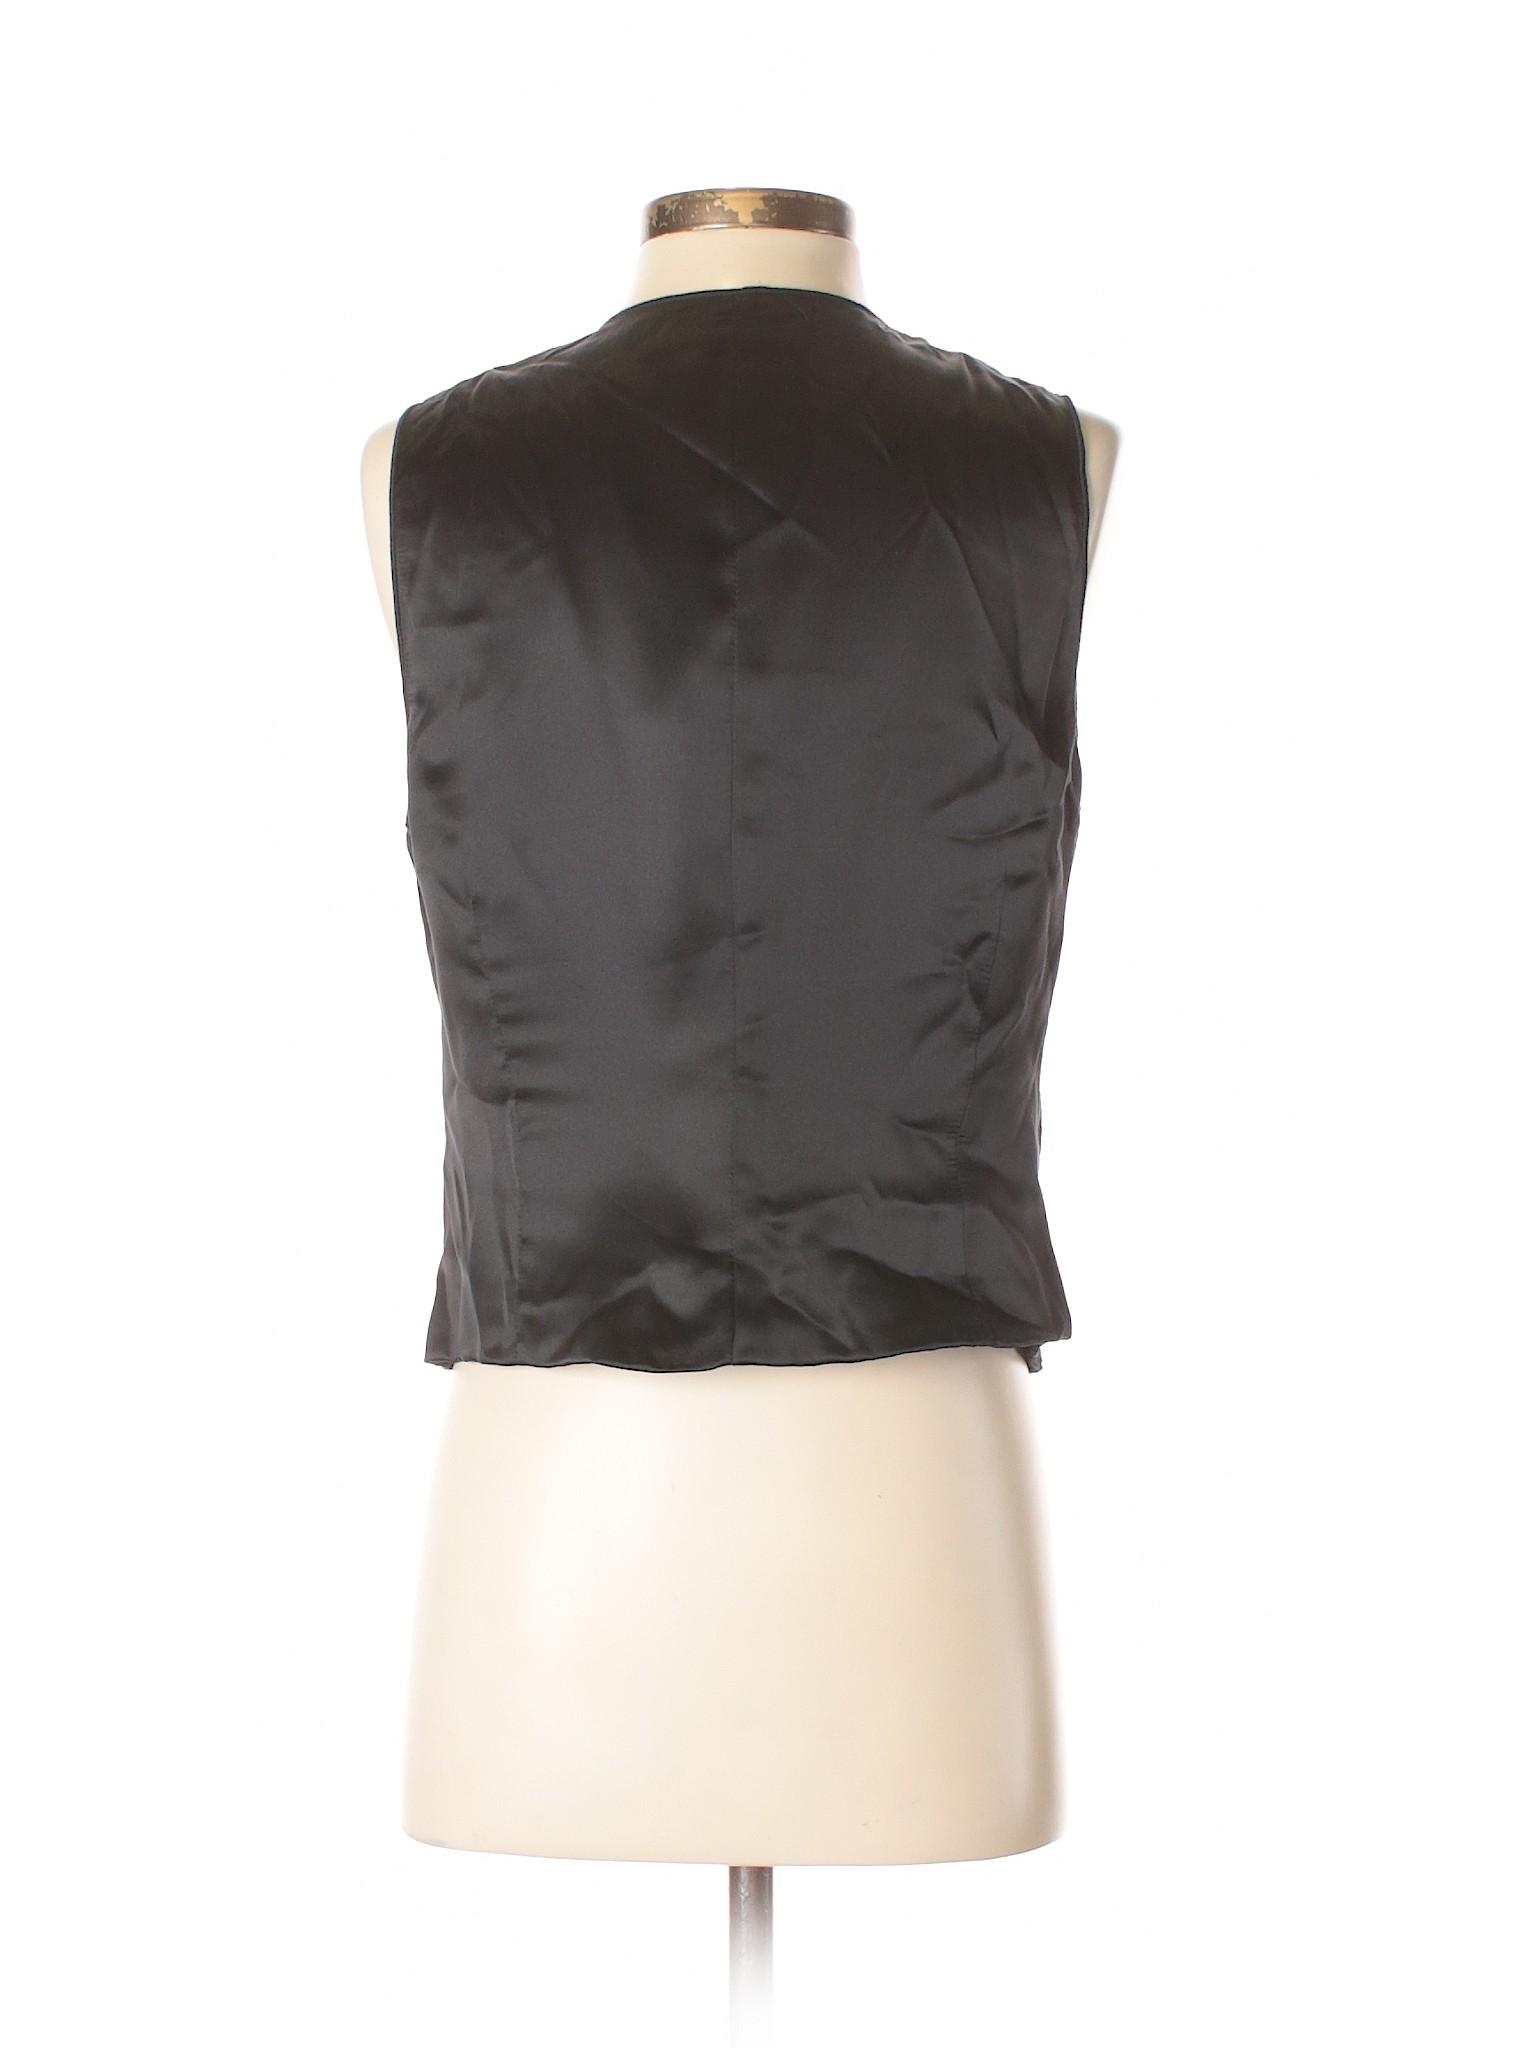 Dolce Vest Tuxedo Gabbana amp; winter Leisure 1Sqp00